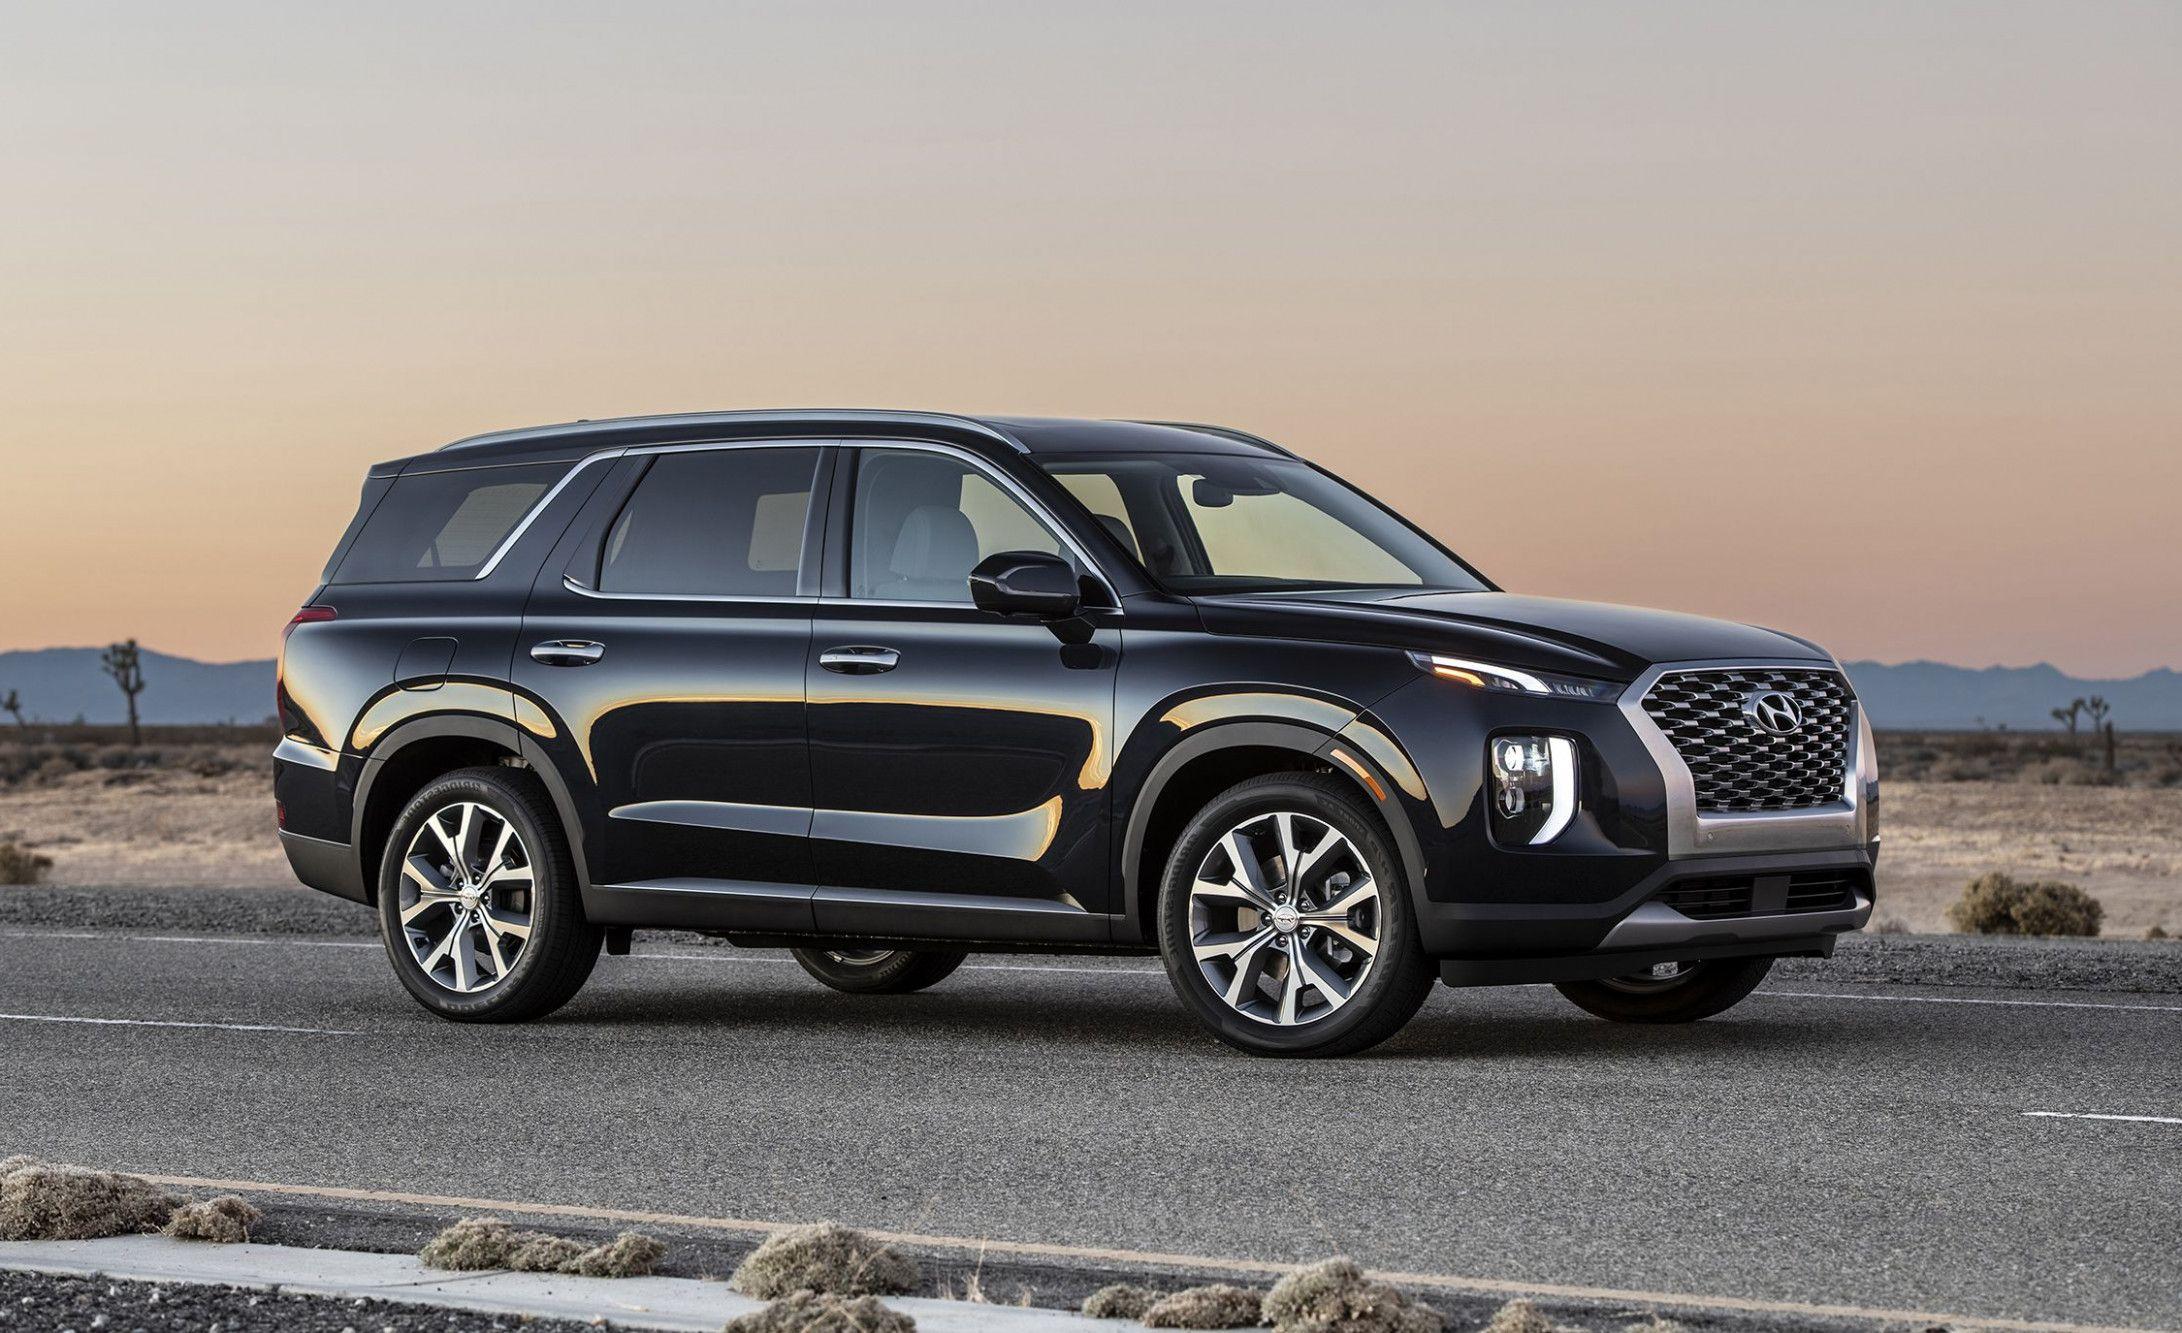 Why You Should Not Go To Hyundai New Suv 2020 New Suv Large Suv New Hyundai